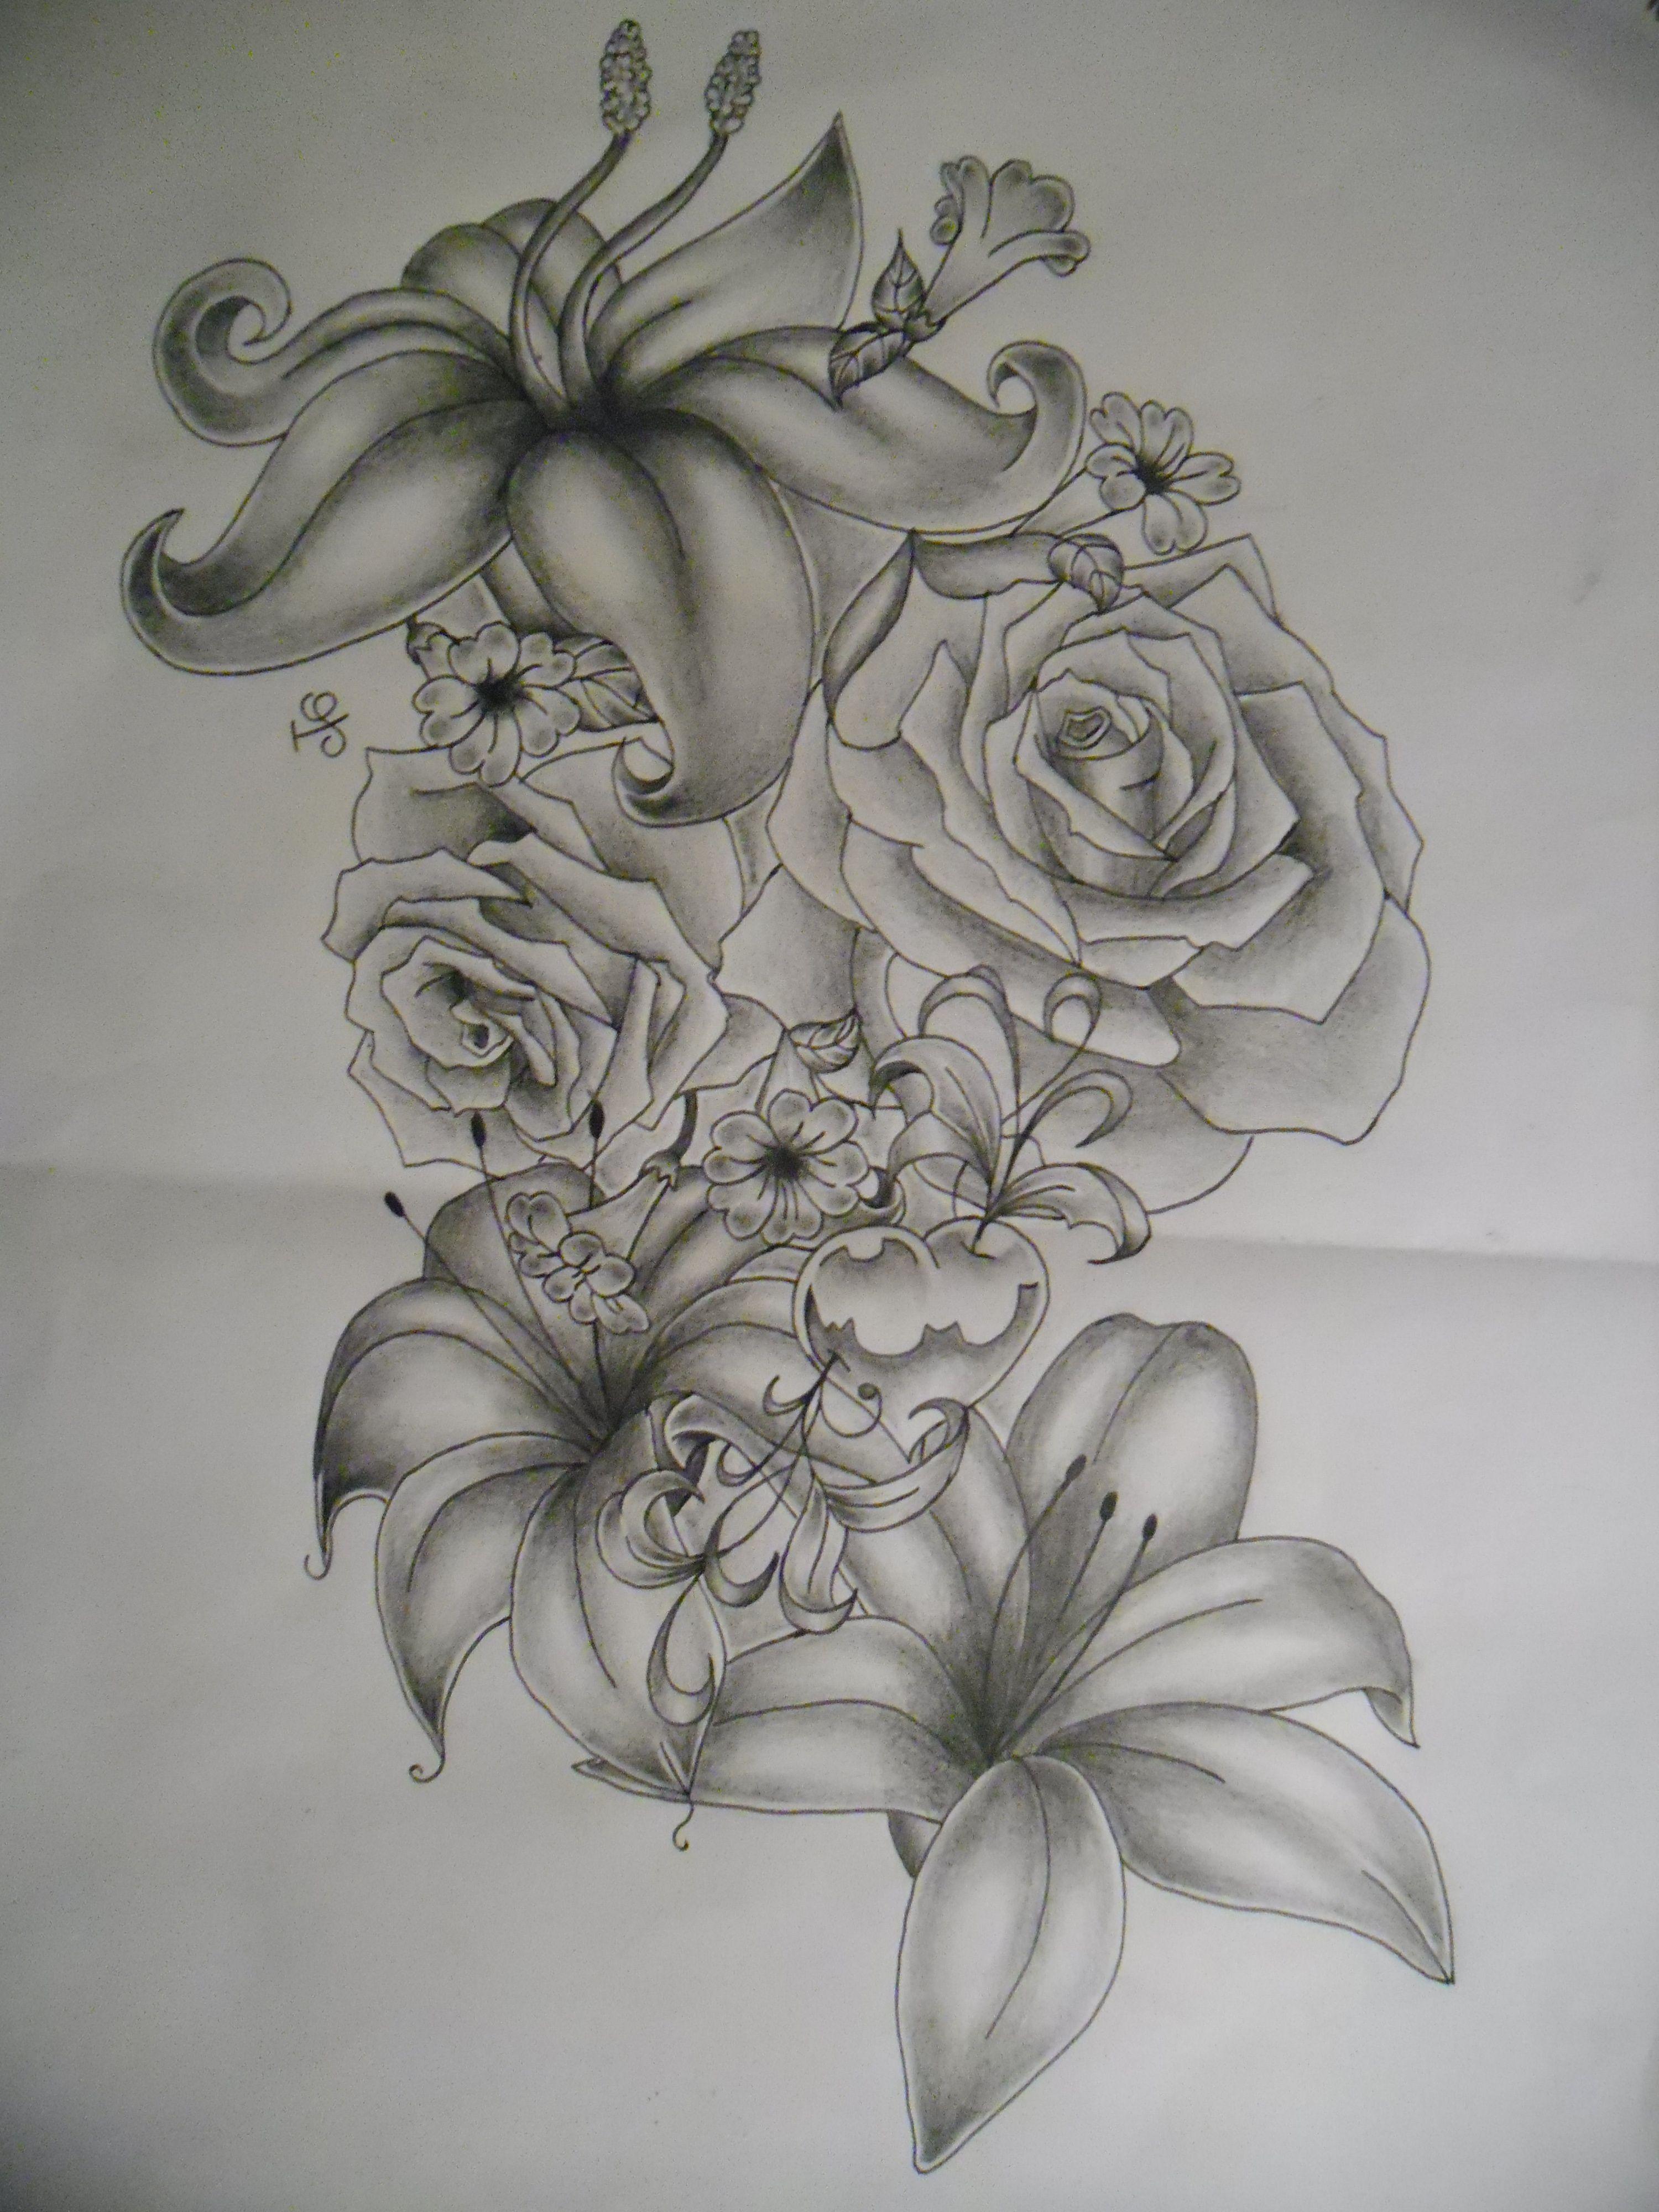 Half Sleeve Tattoo Drawings For Women Bing Images Half Sleeve Tattoos Drawings Rose Tattoos Tattoos